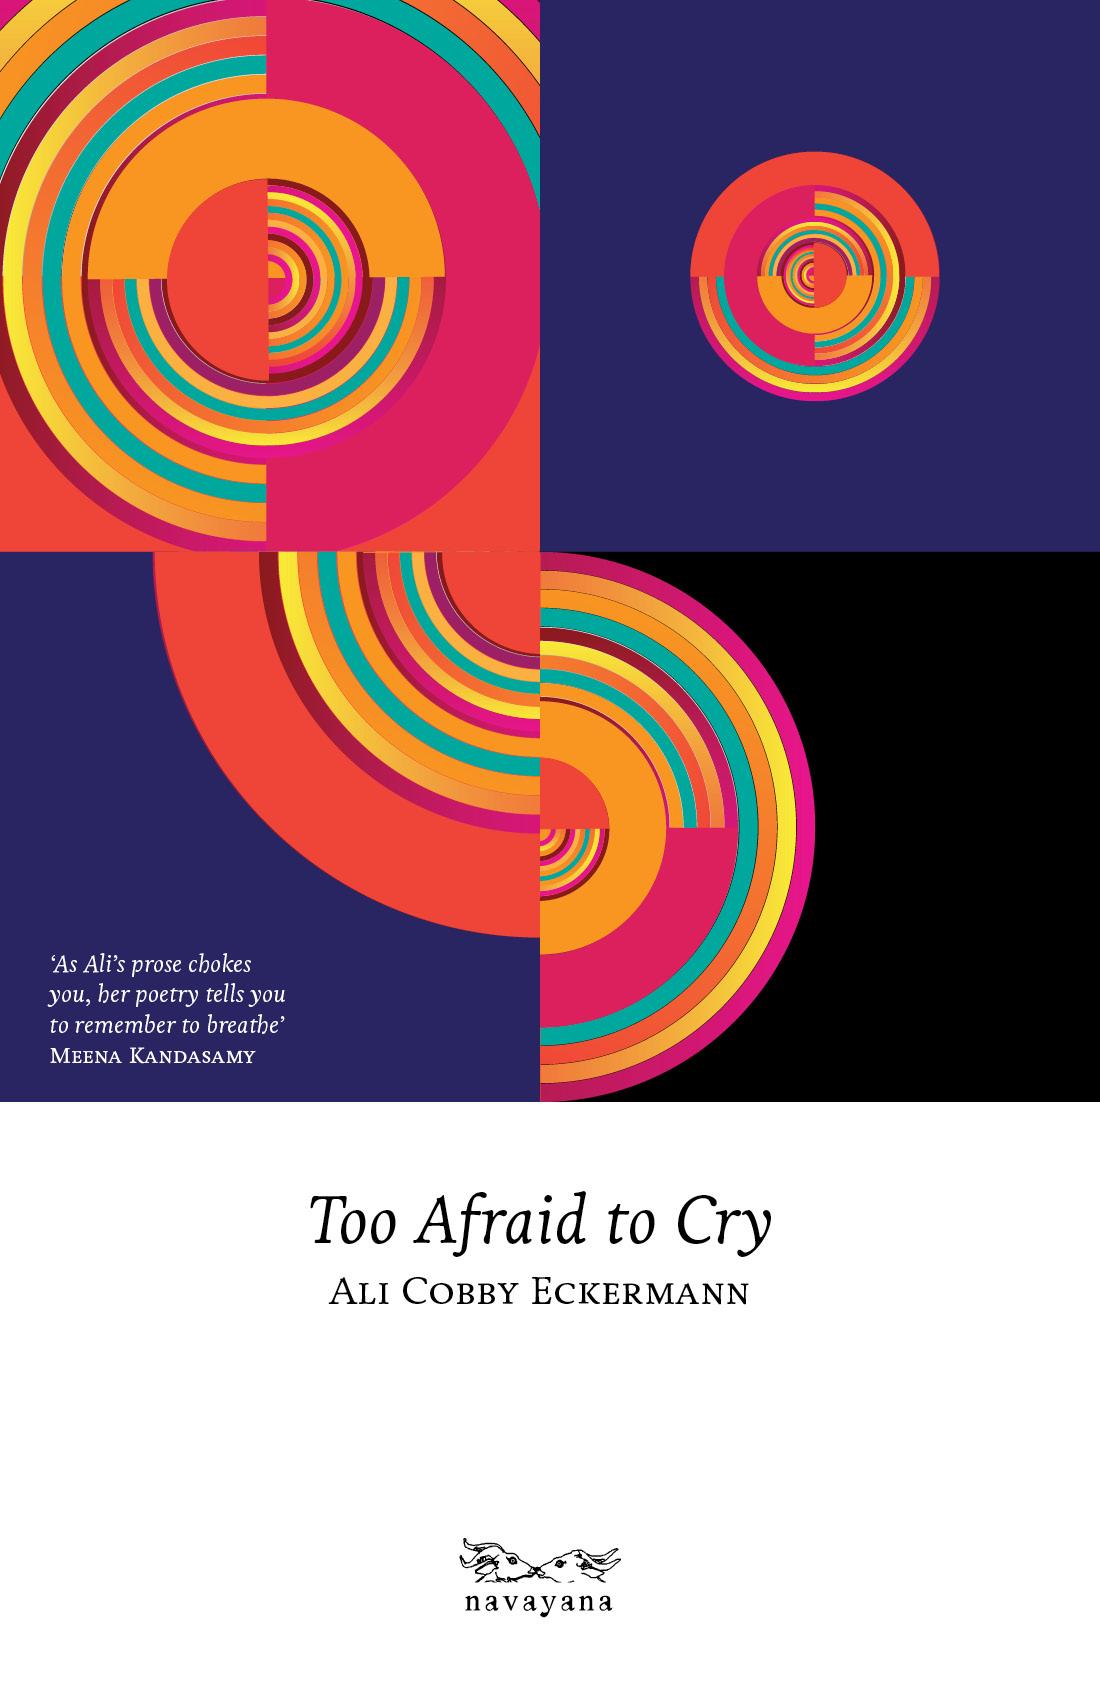 Ali Cobby EckermannToo Afraid to CryNavayana, 2015